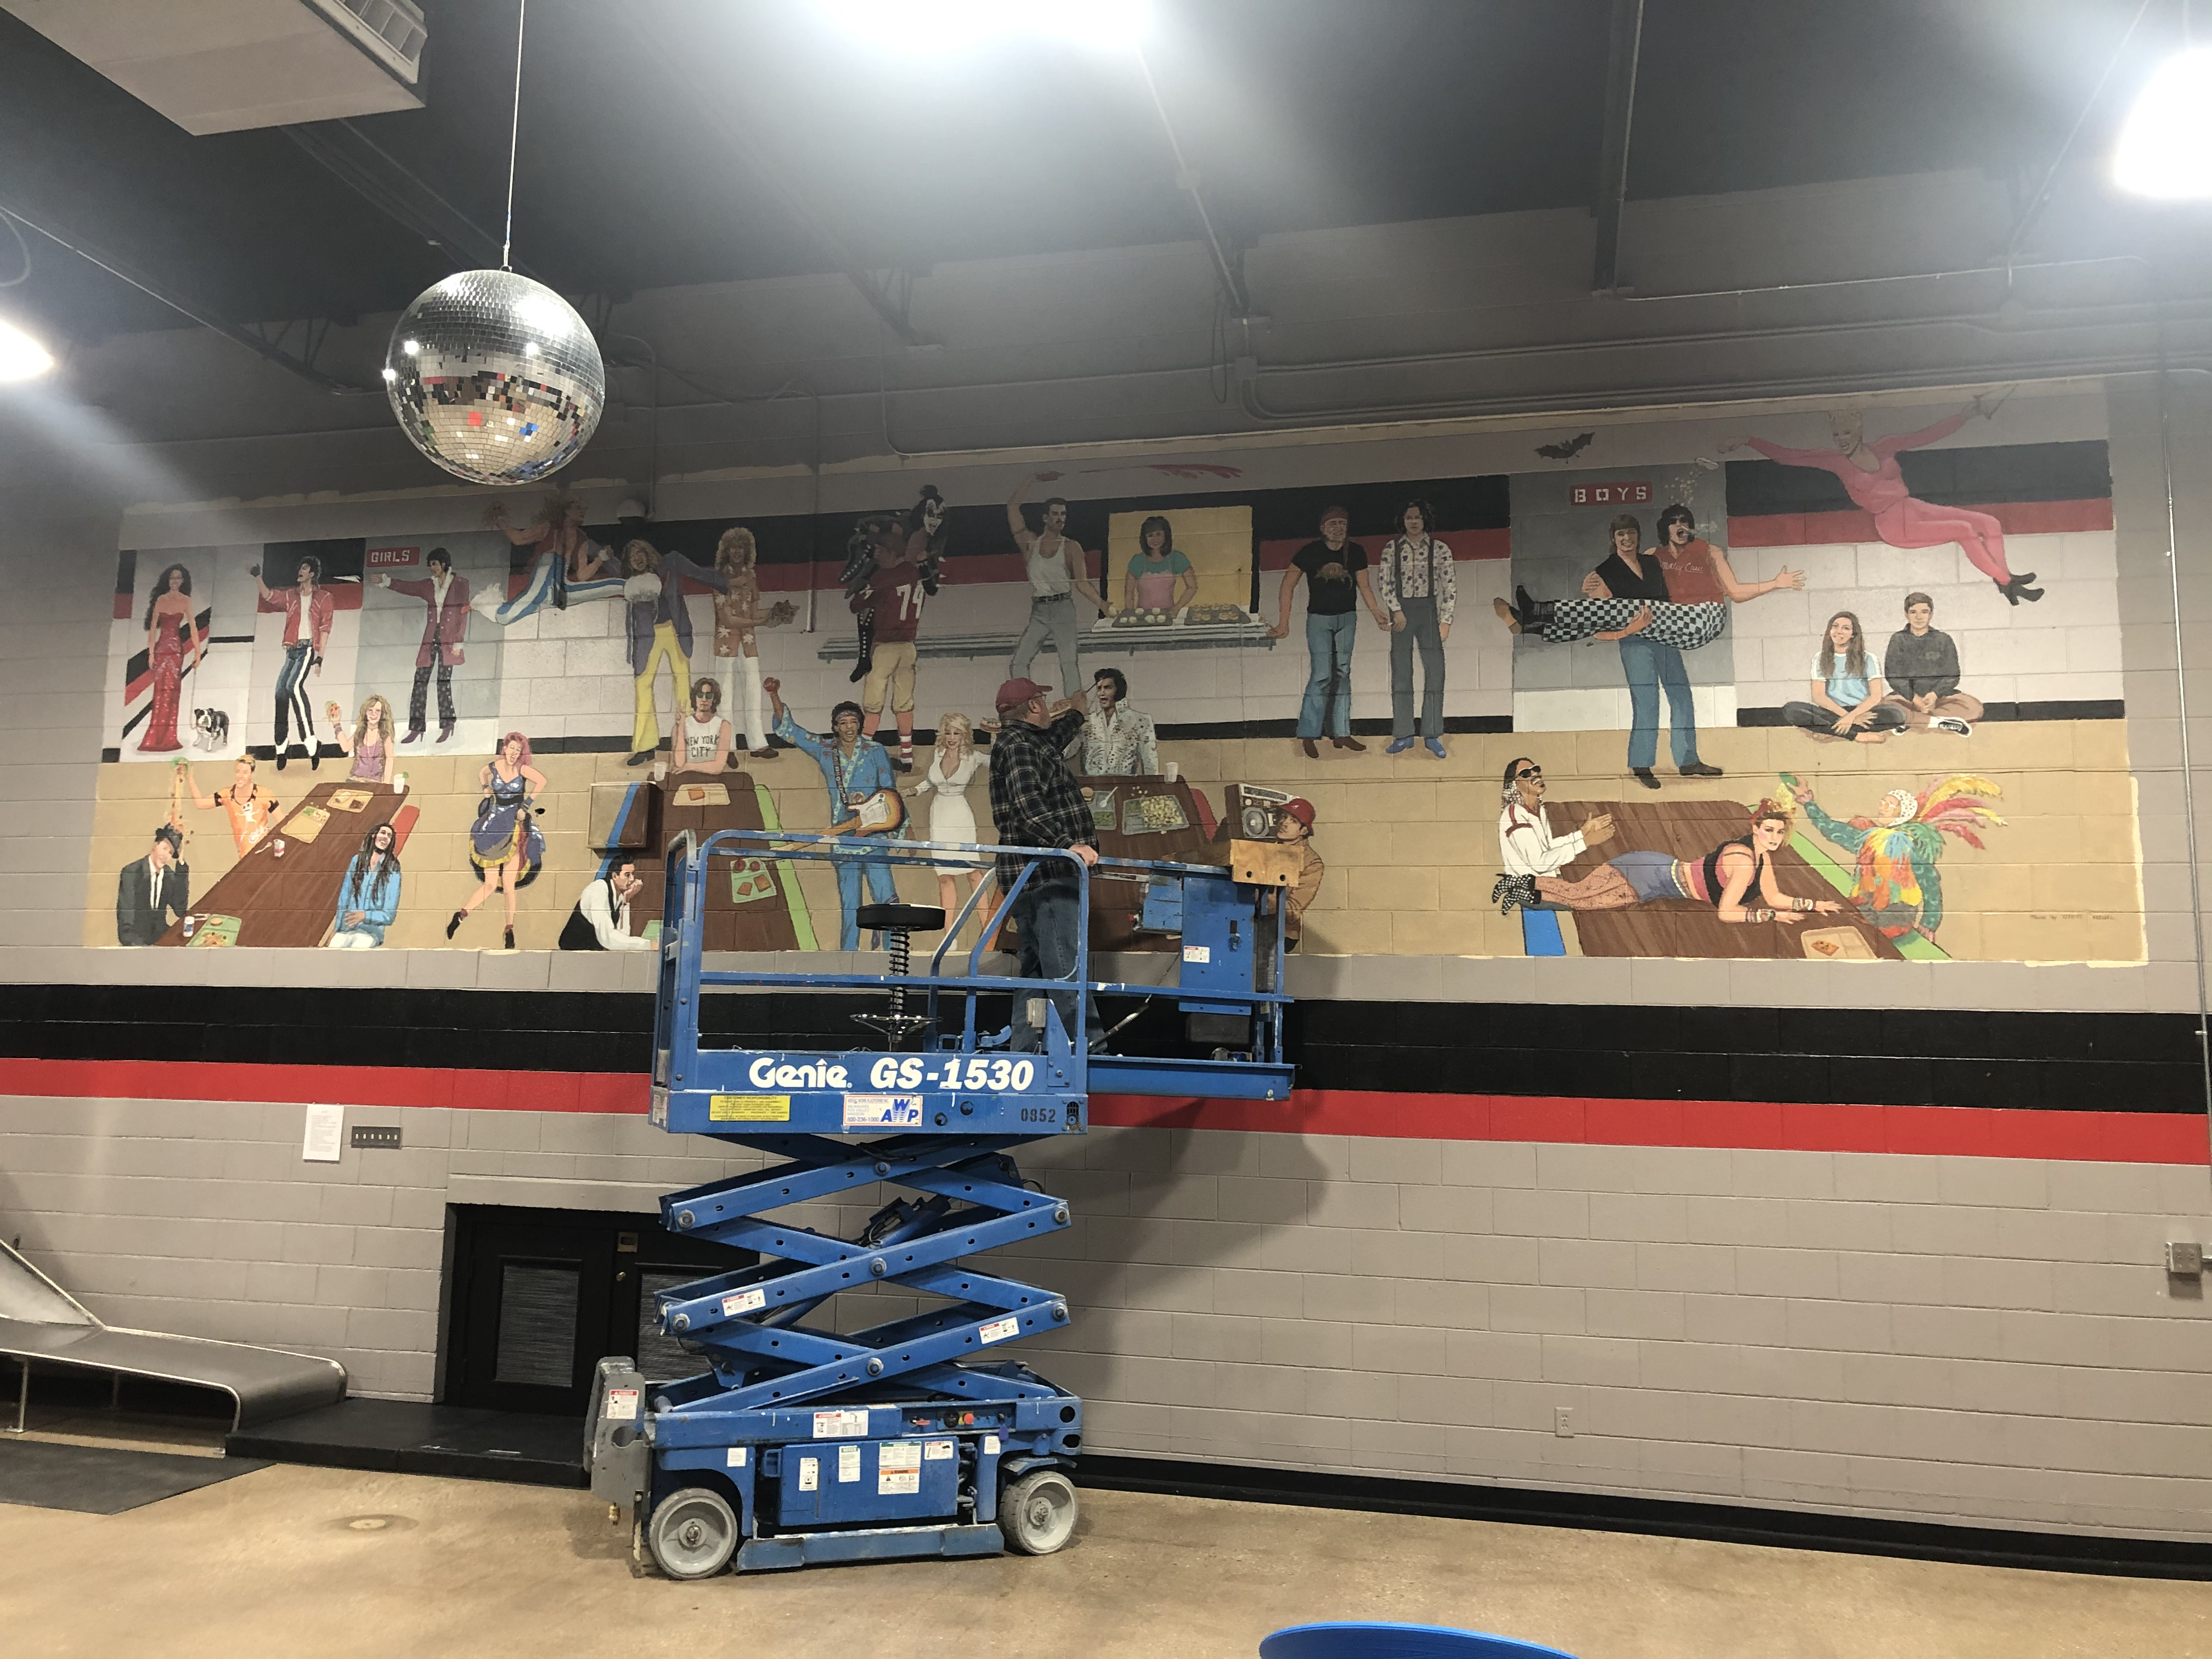 steve - old school mural artist